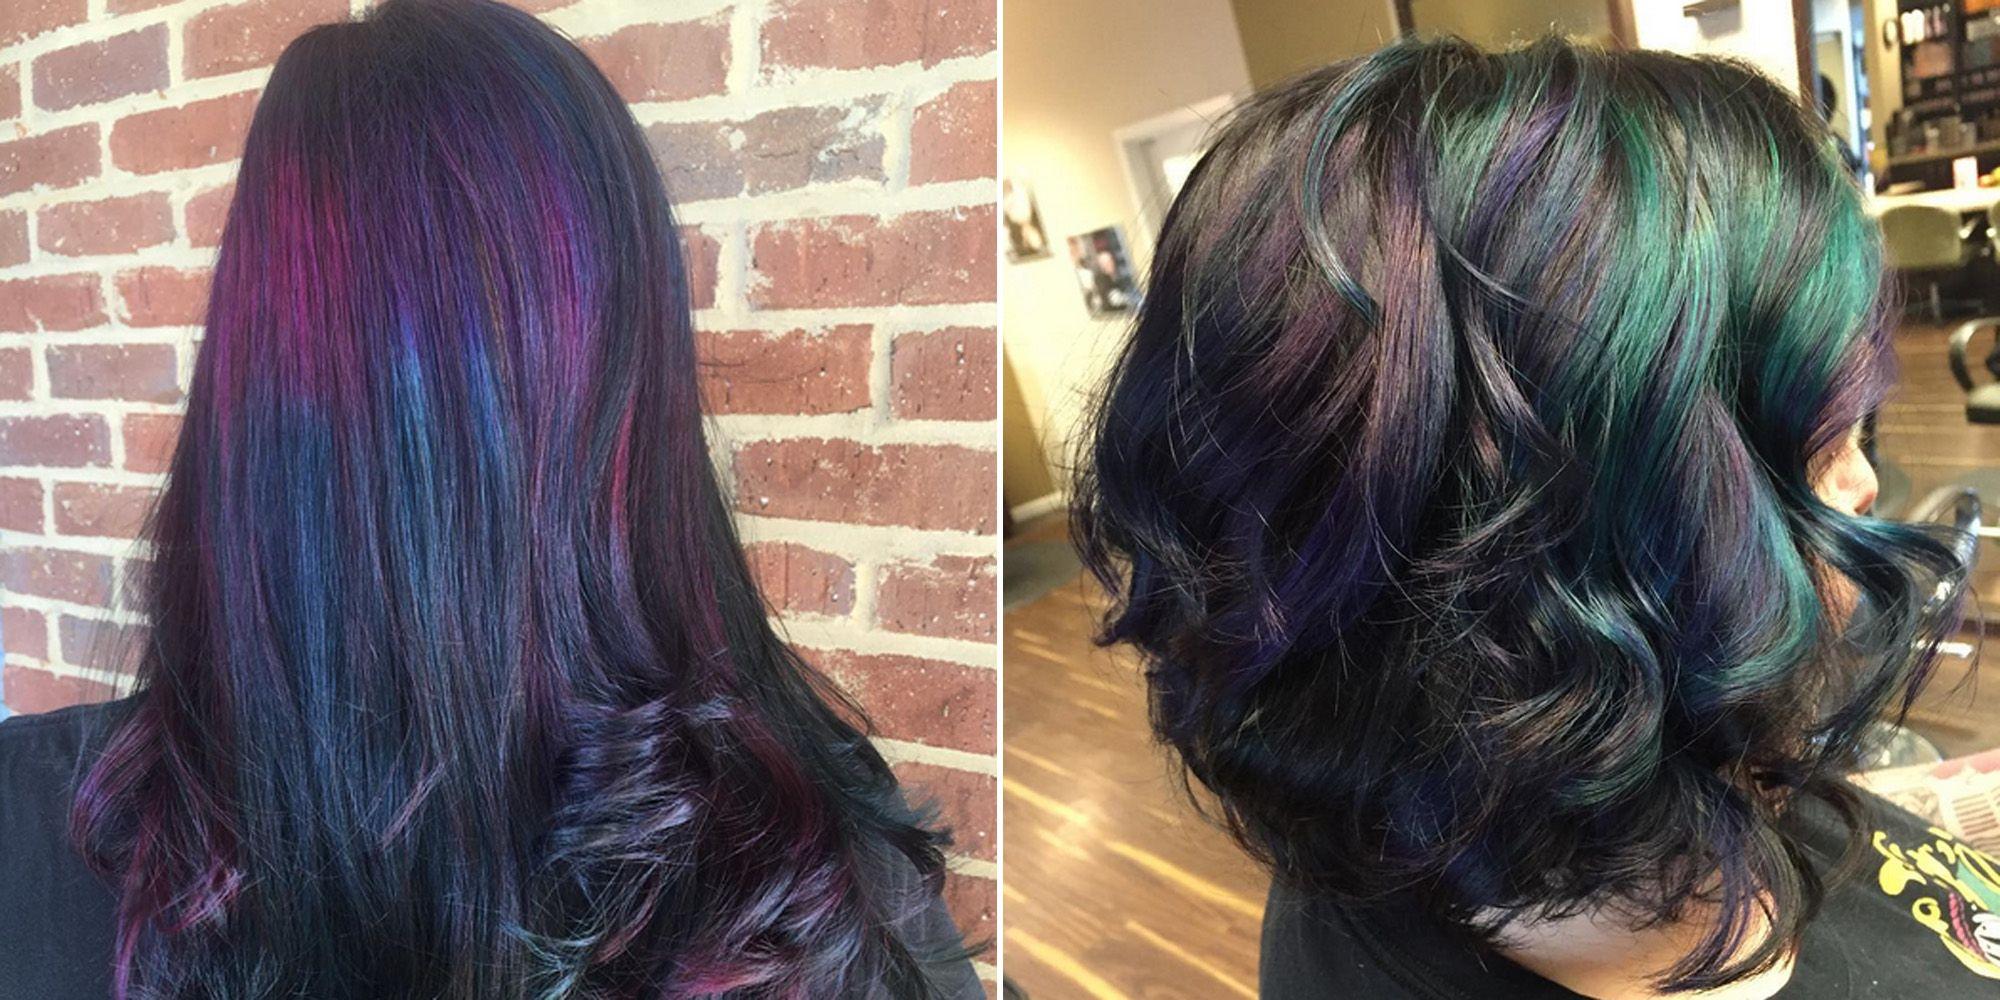 Oil slick hair color trend 2015 hair dye trends solutioingenieria Choice Image